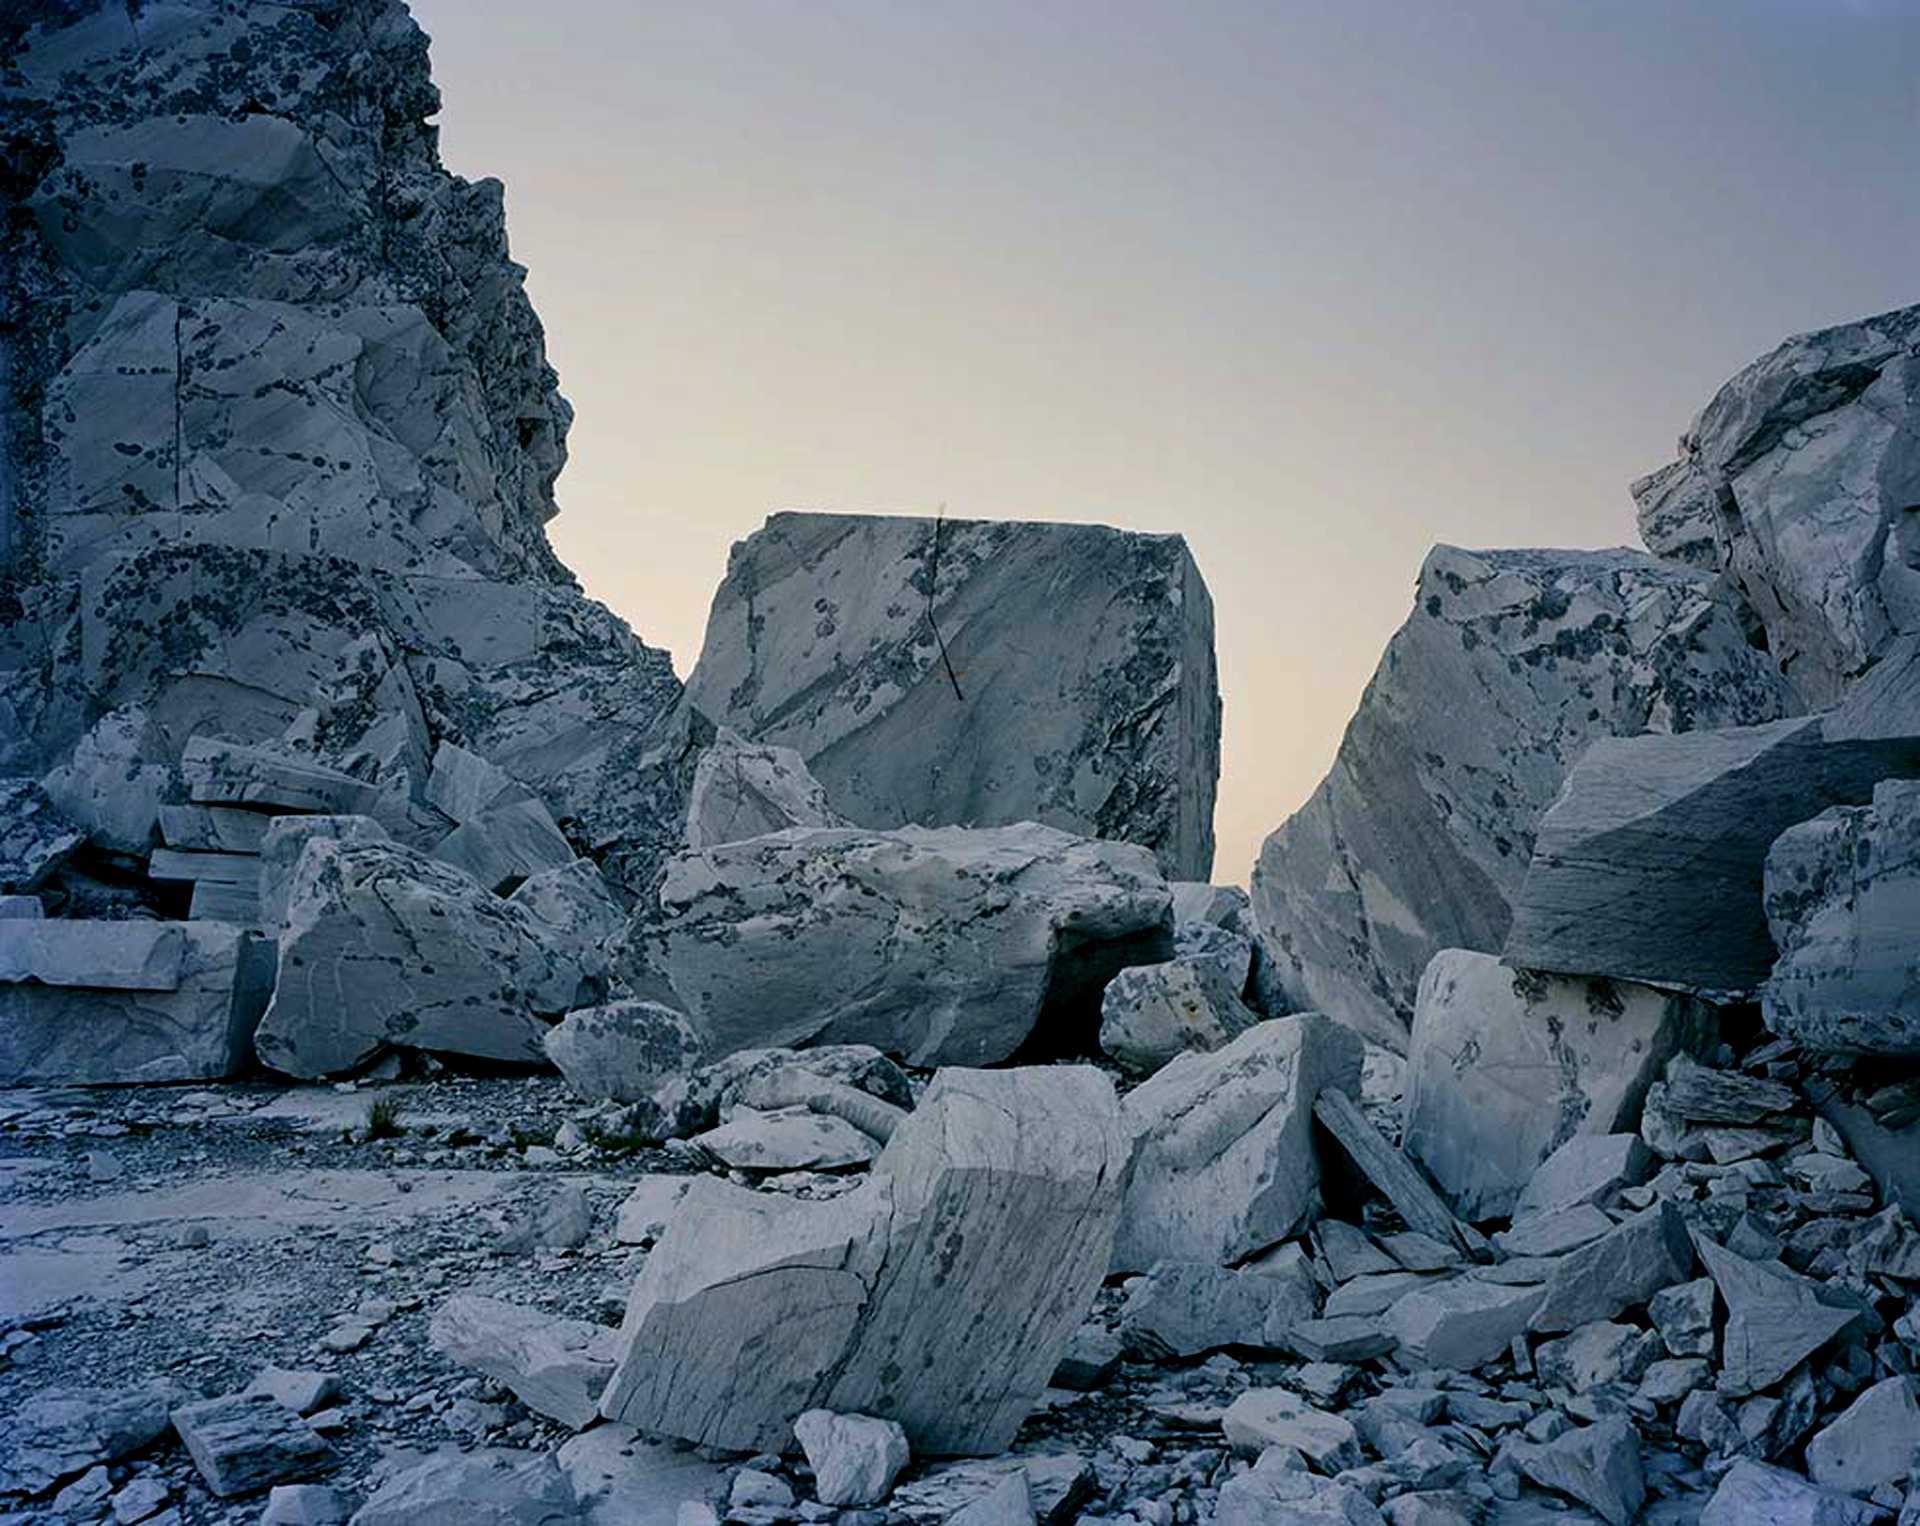 Alpi Apuane  - 41 01 30